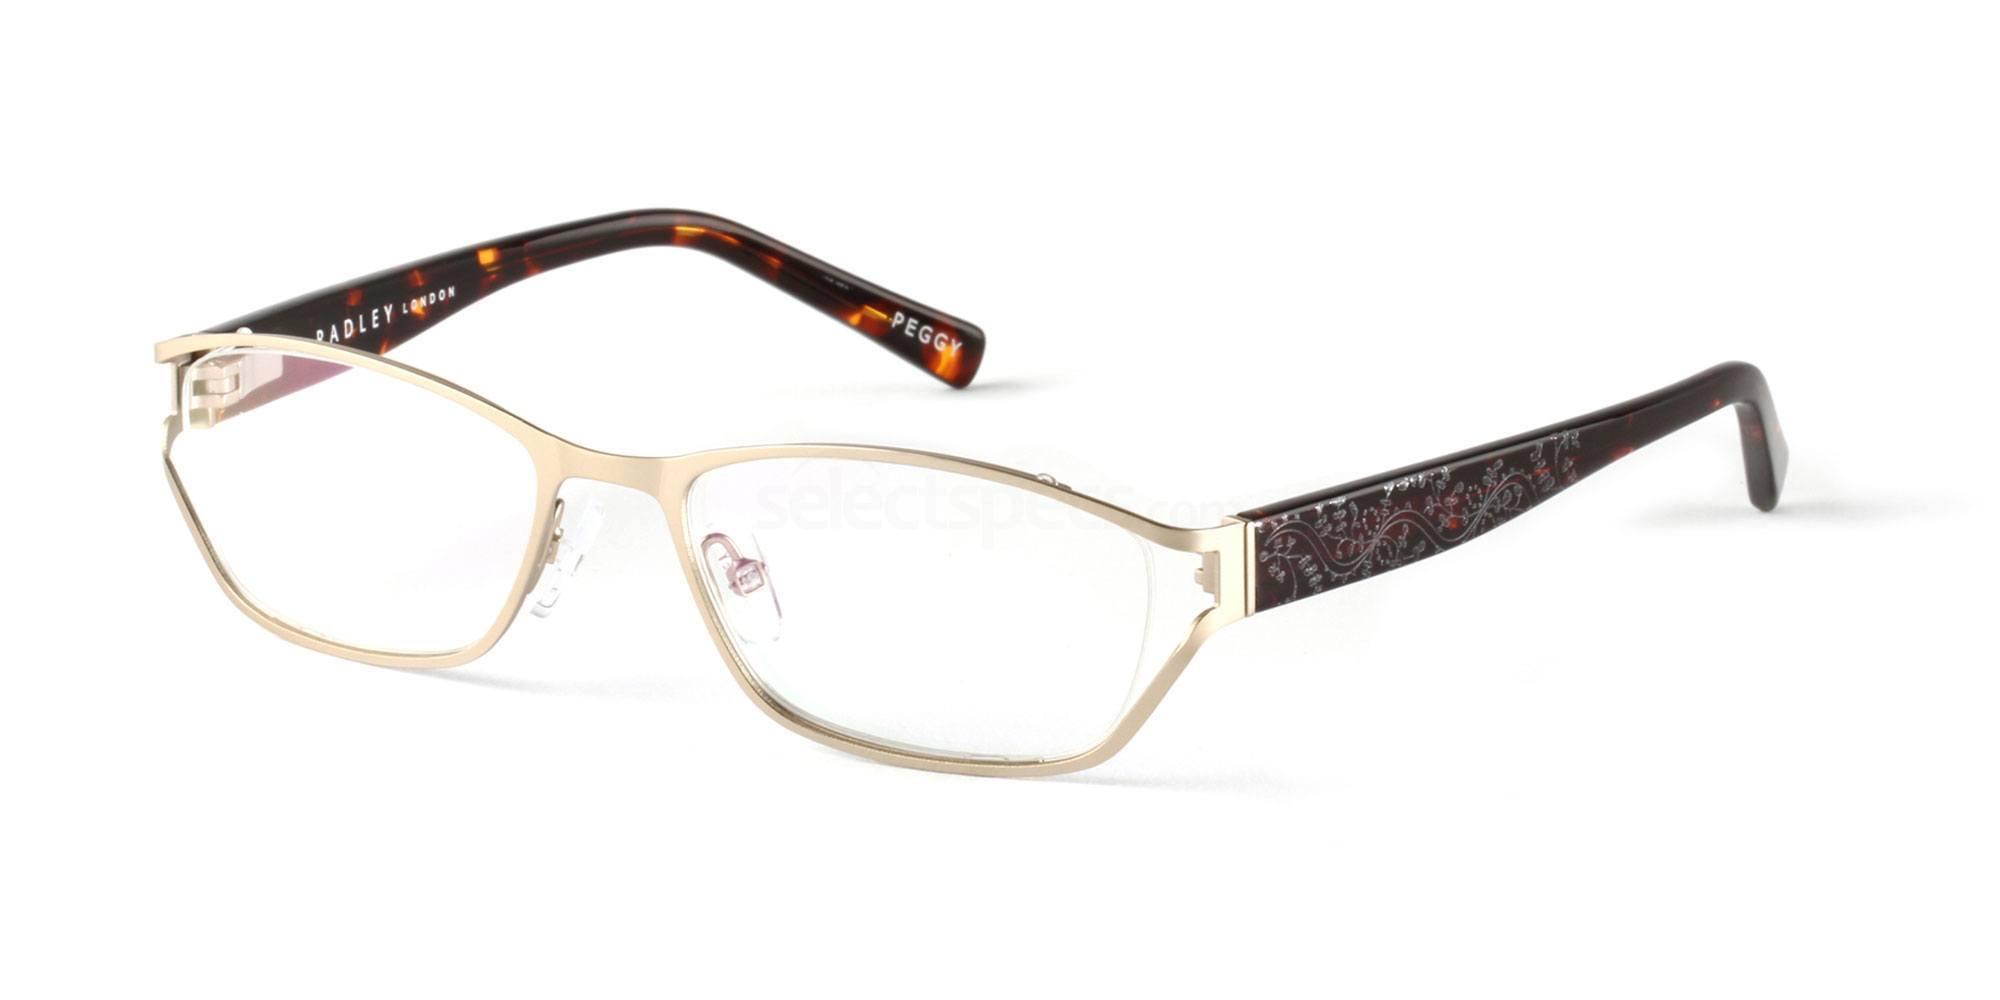 001 RDO-PEGGY Glasses, Radley London